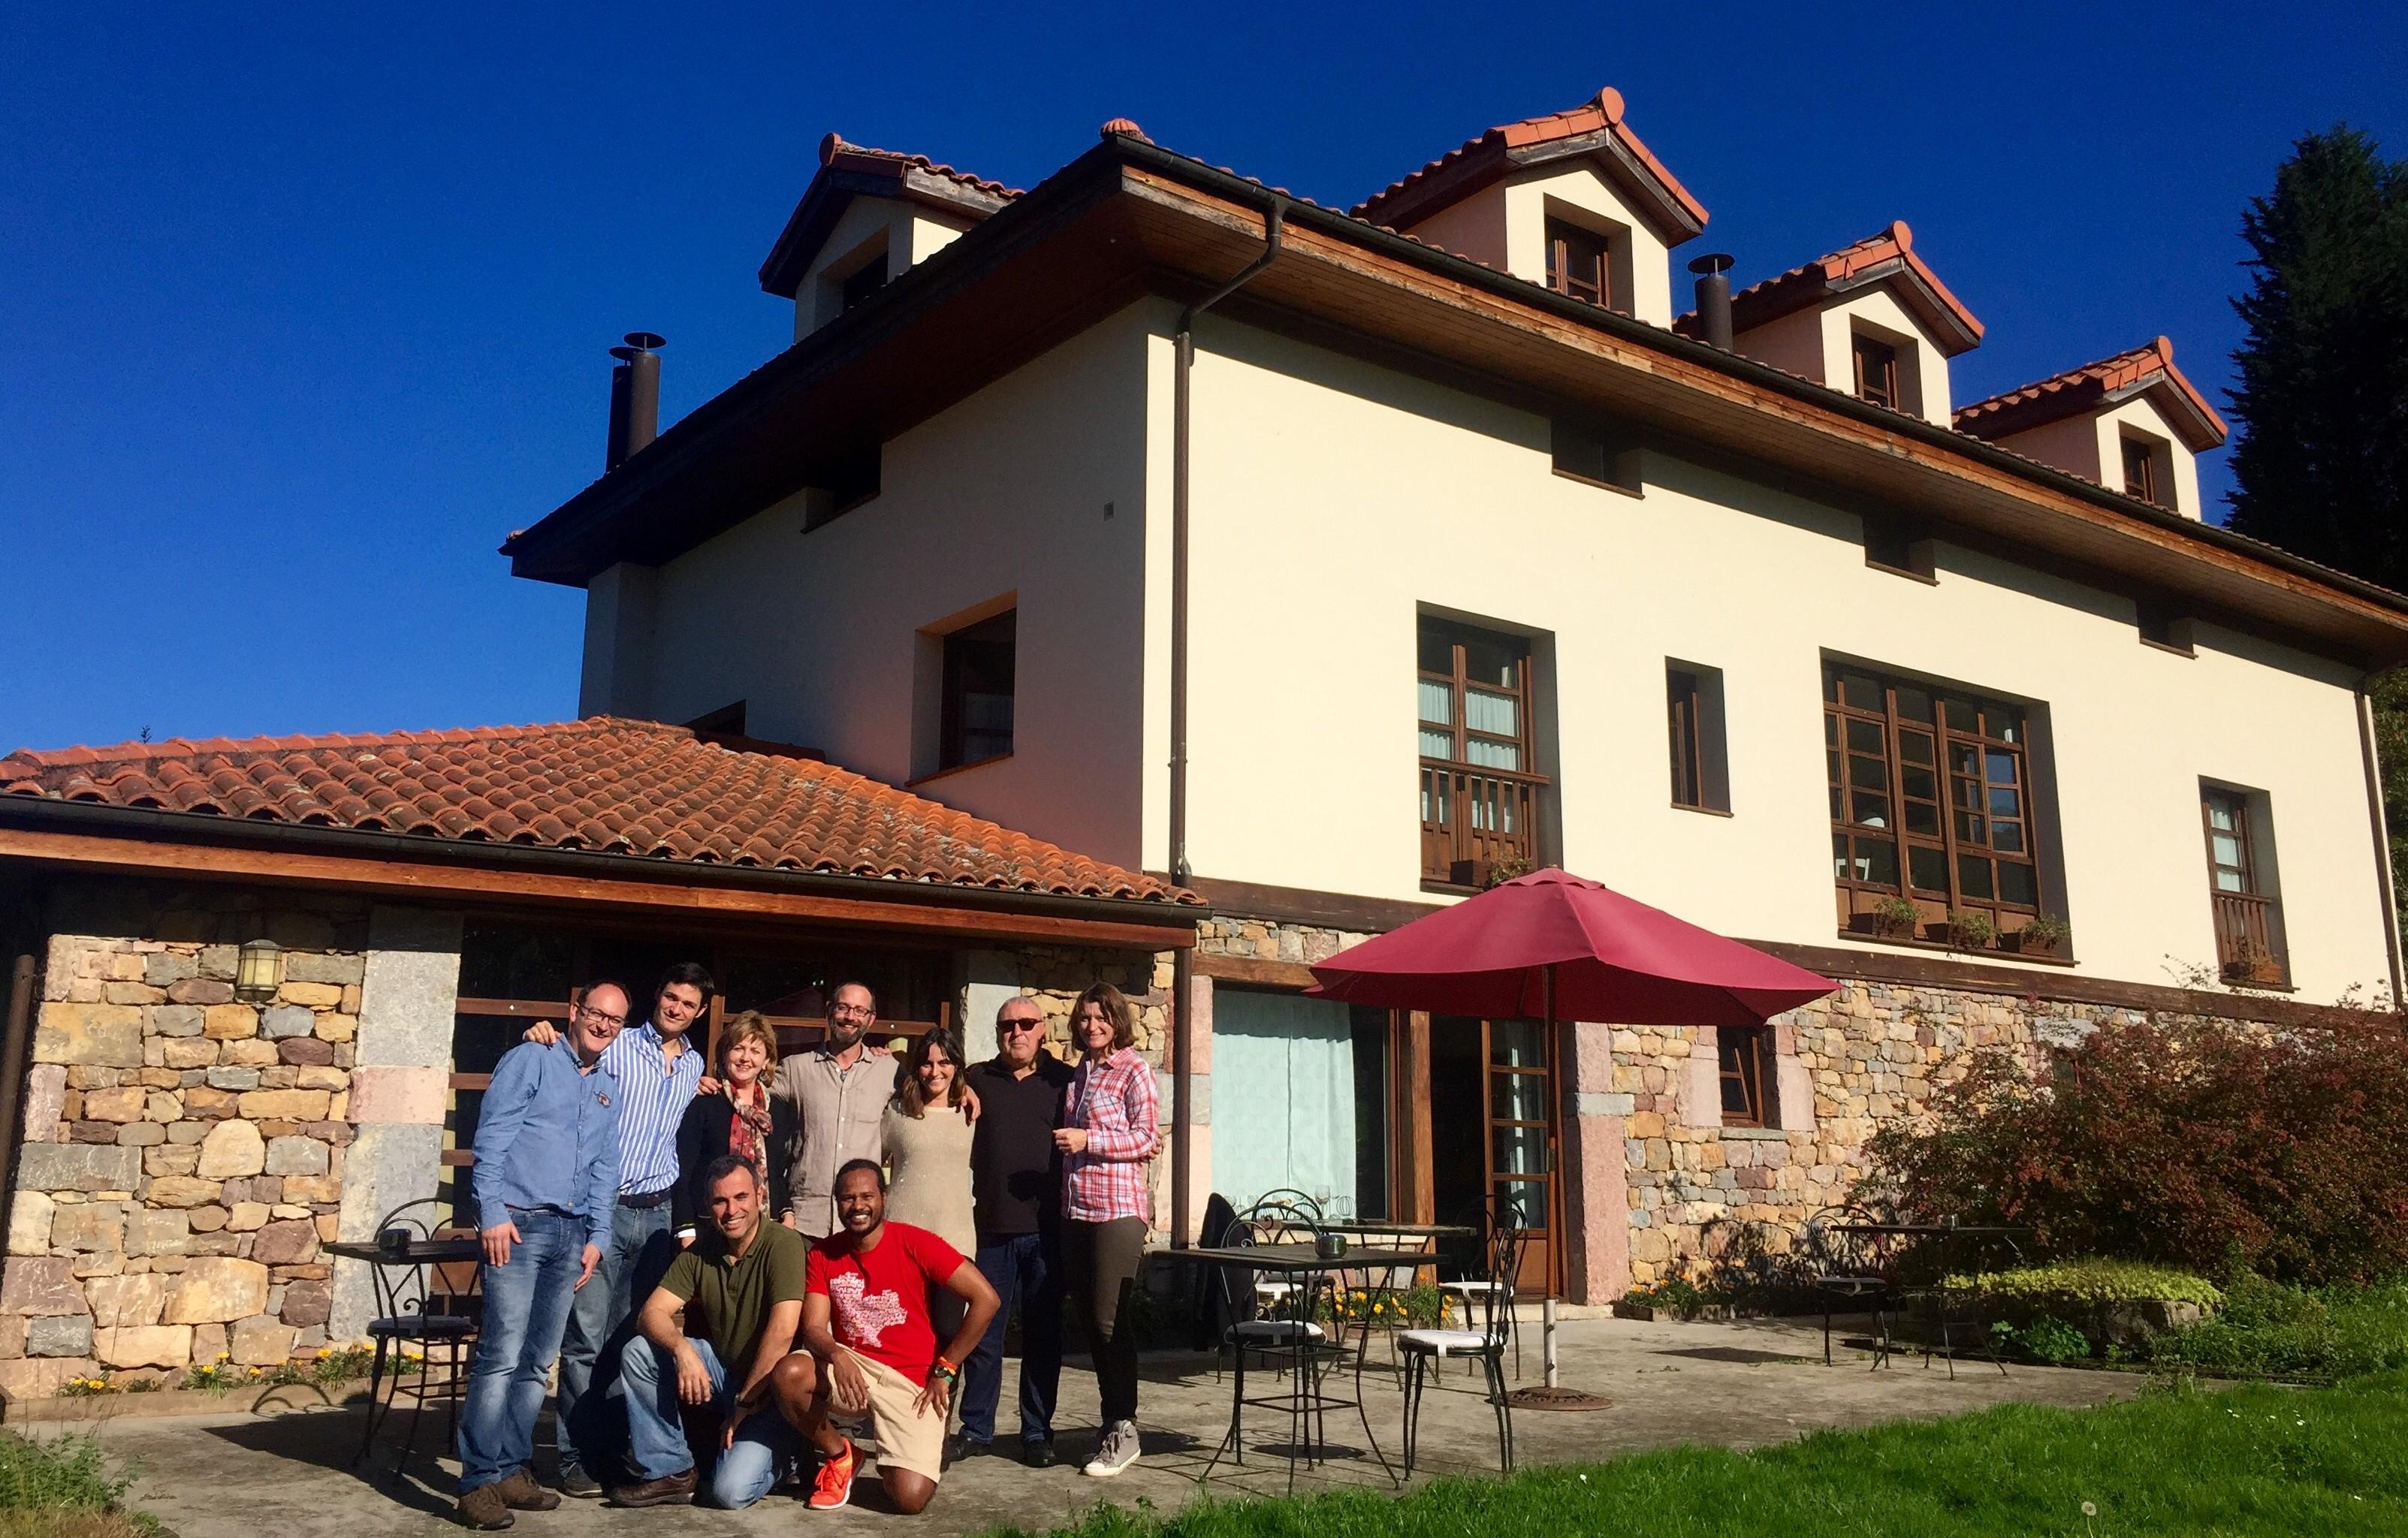 Foto de grupo frente al Hotel Casa de la Veiga